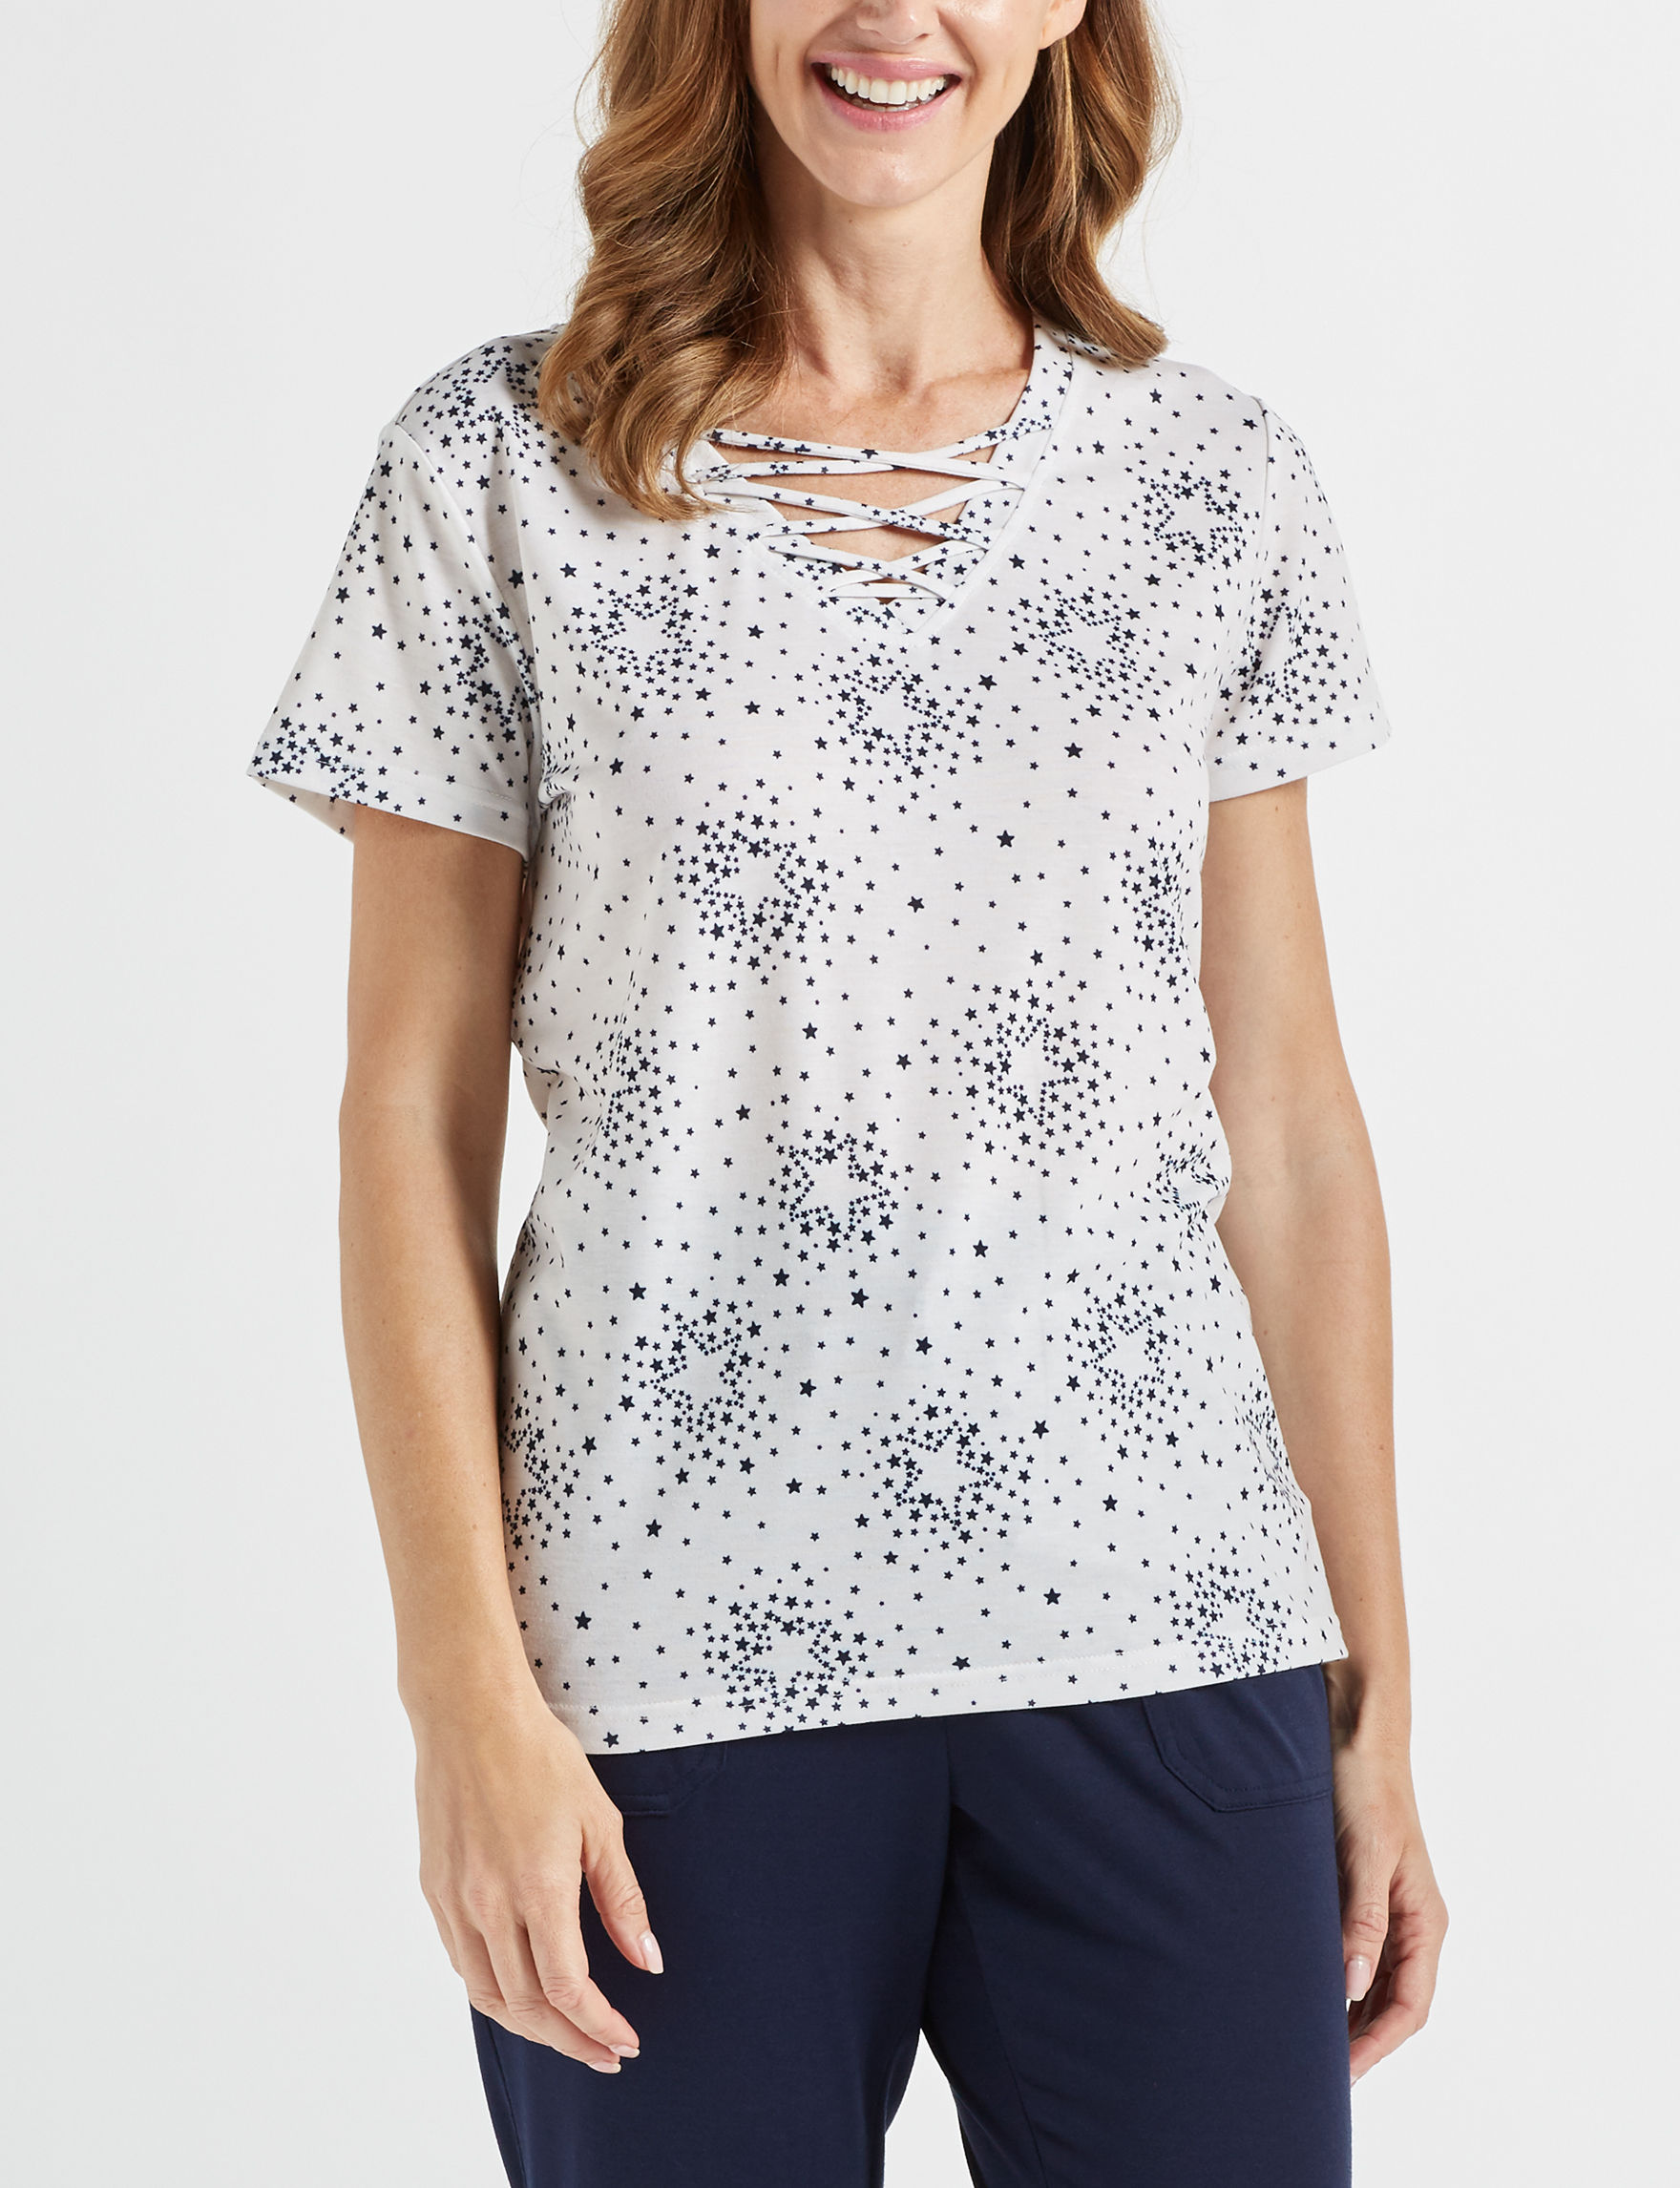 Onyx White Shirts & Blouses